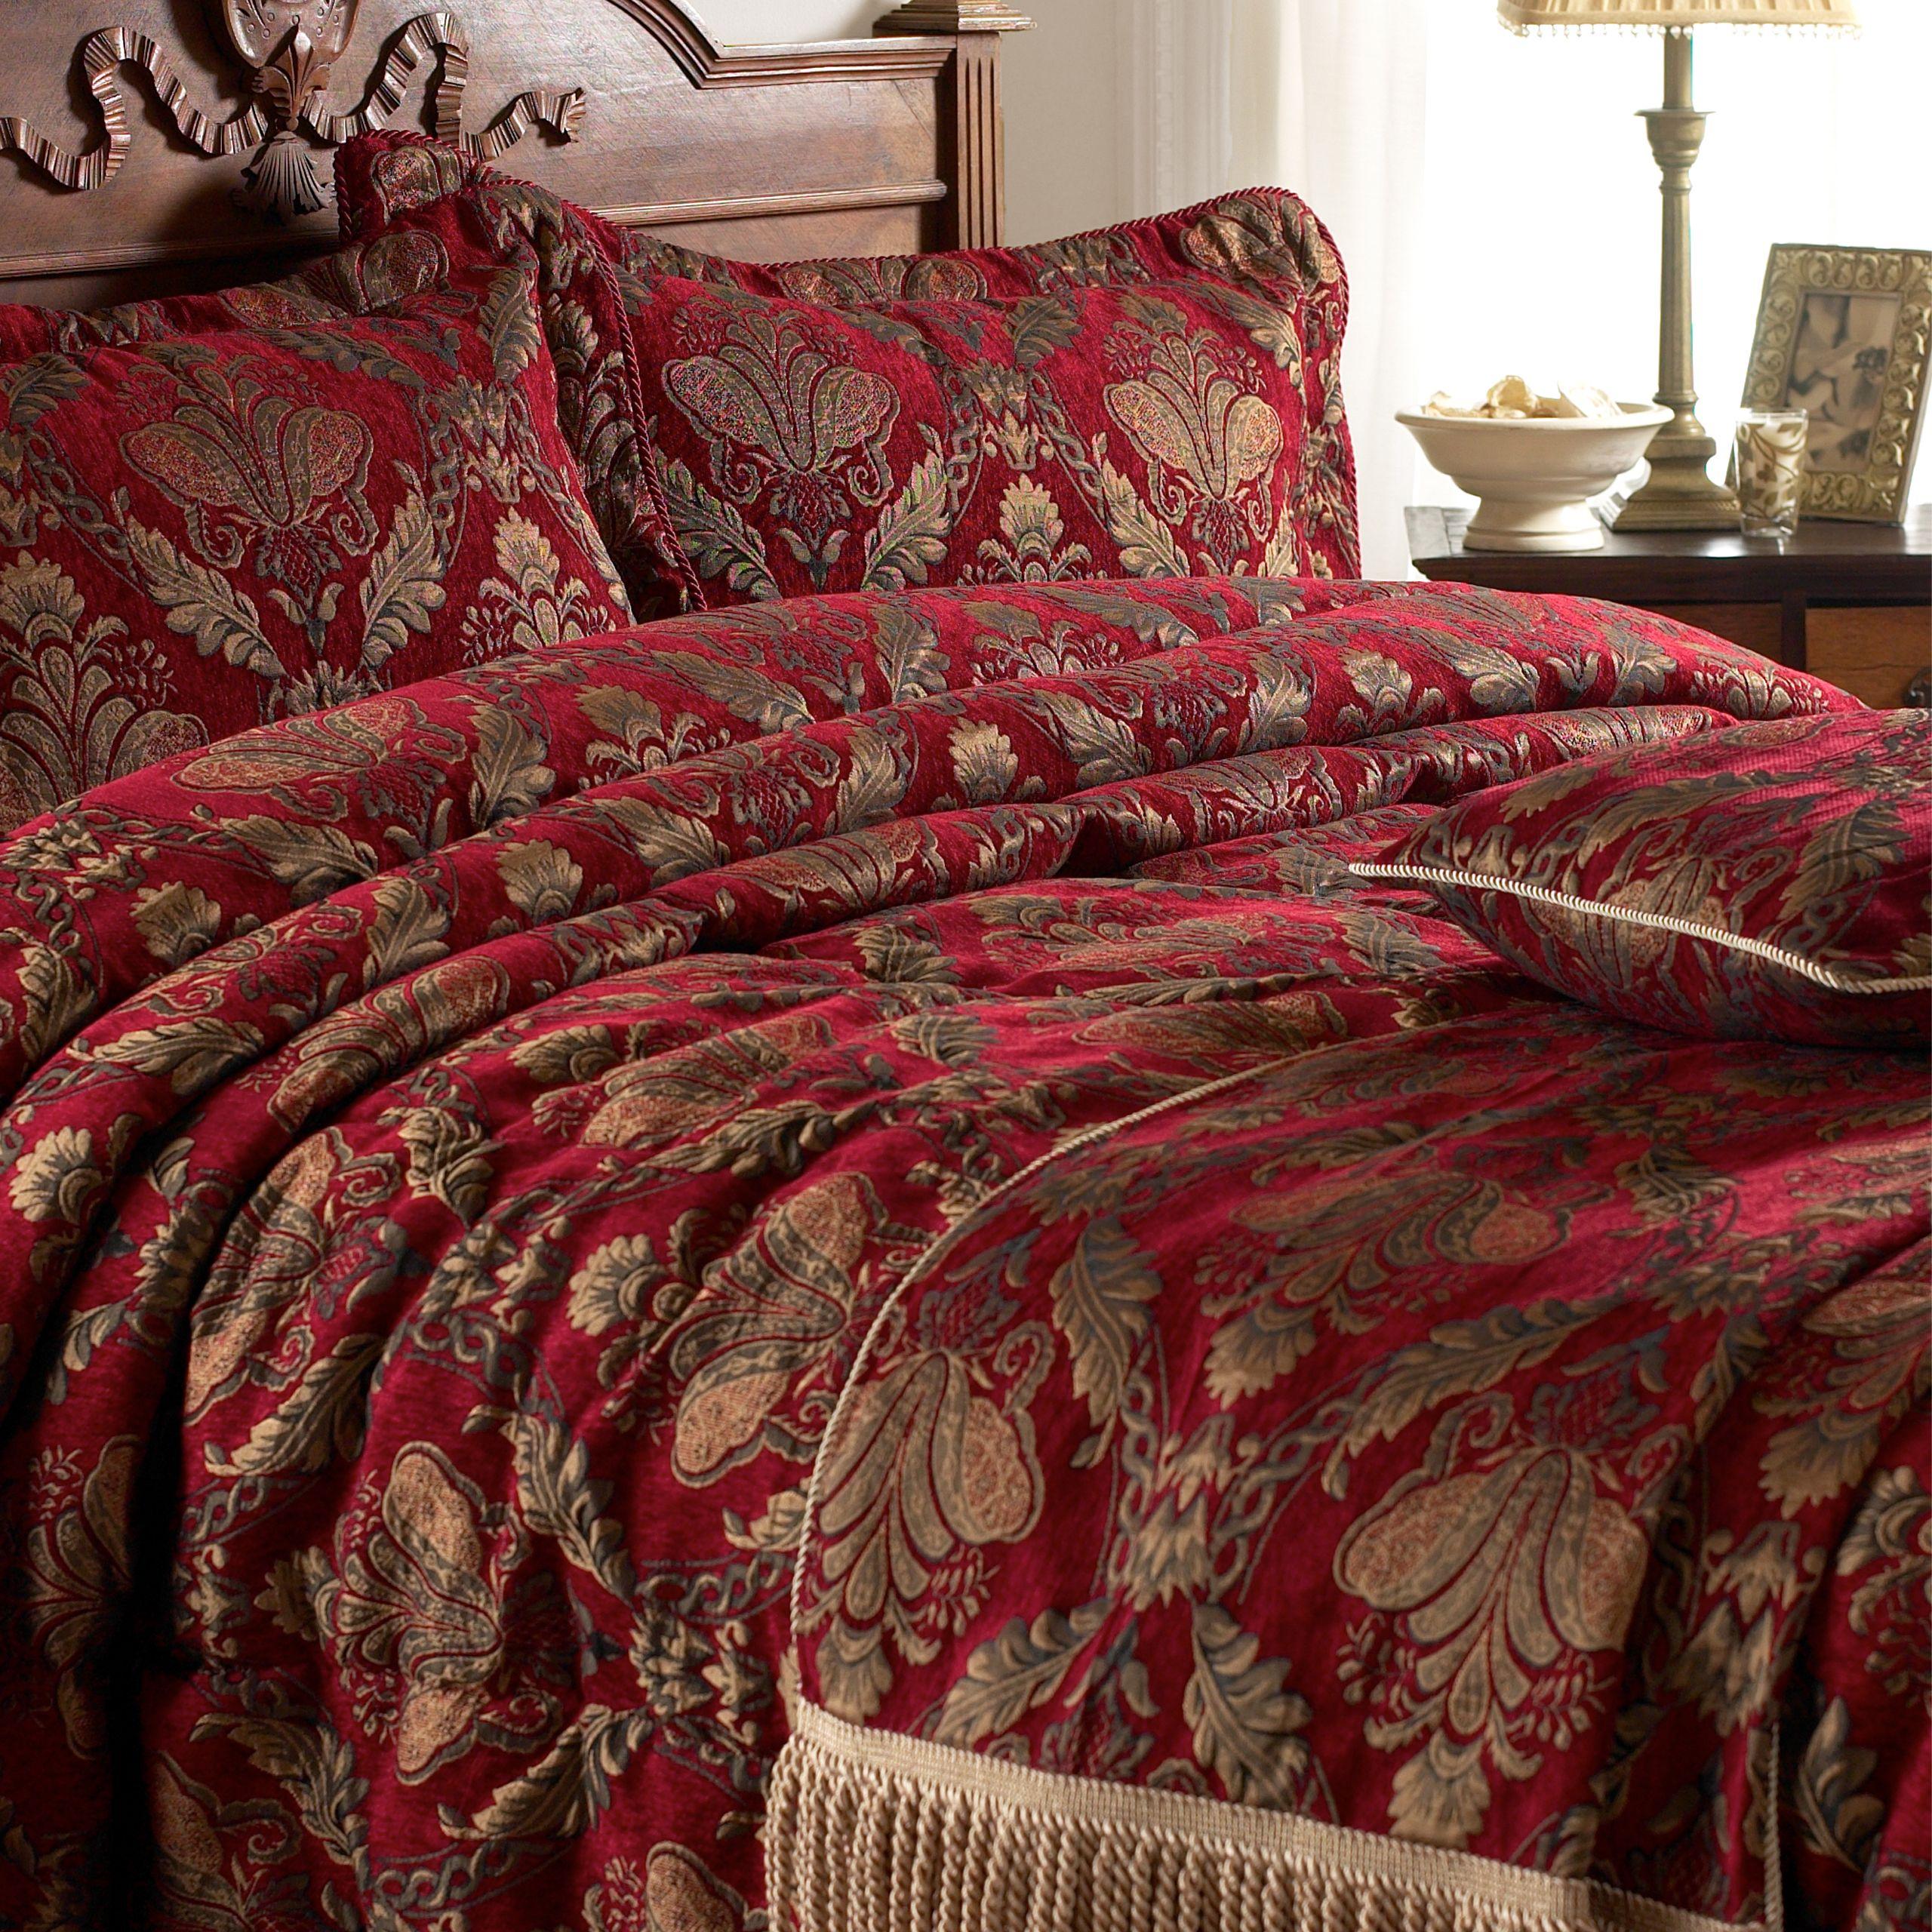 Shiraz Bedspread Burgundy